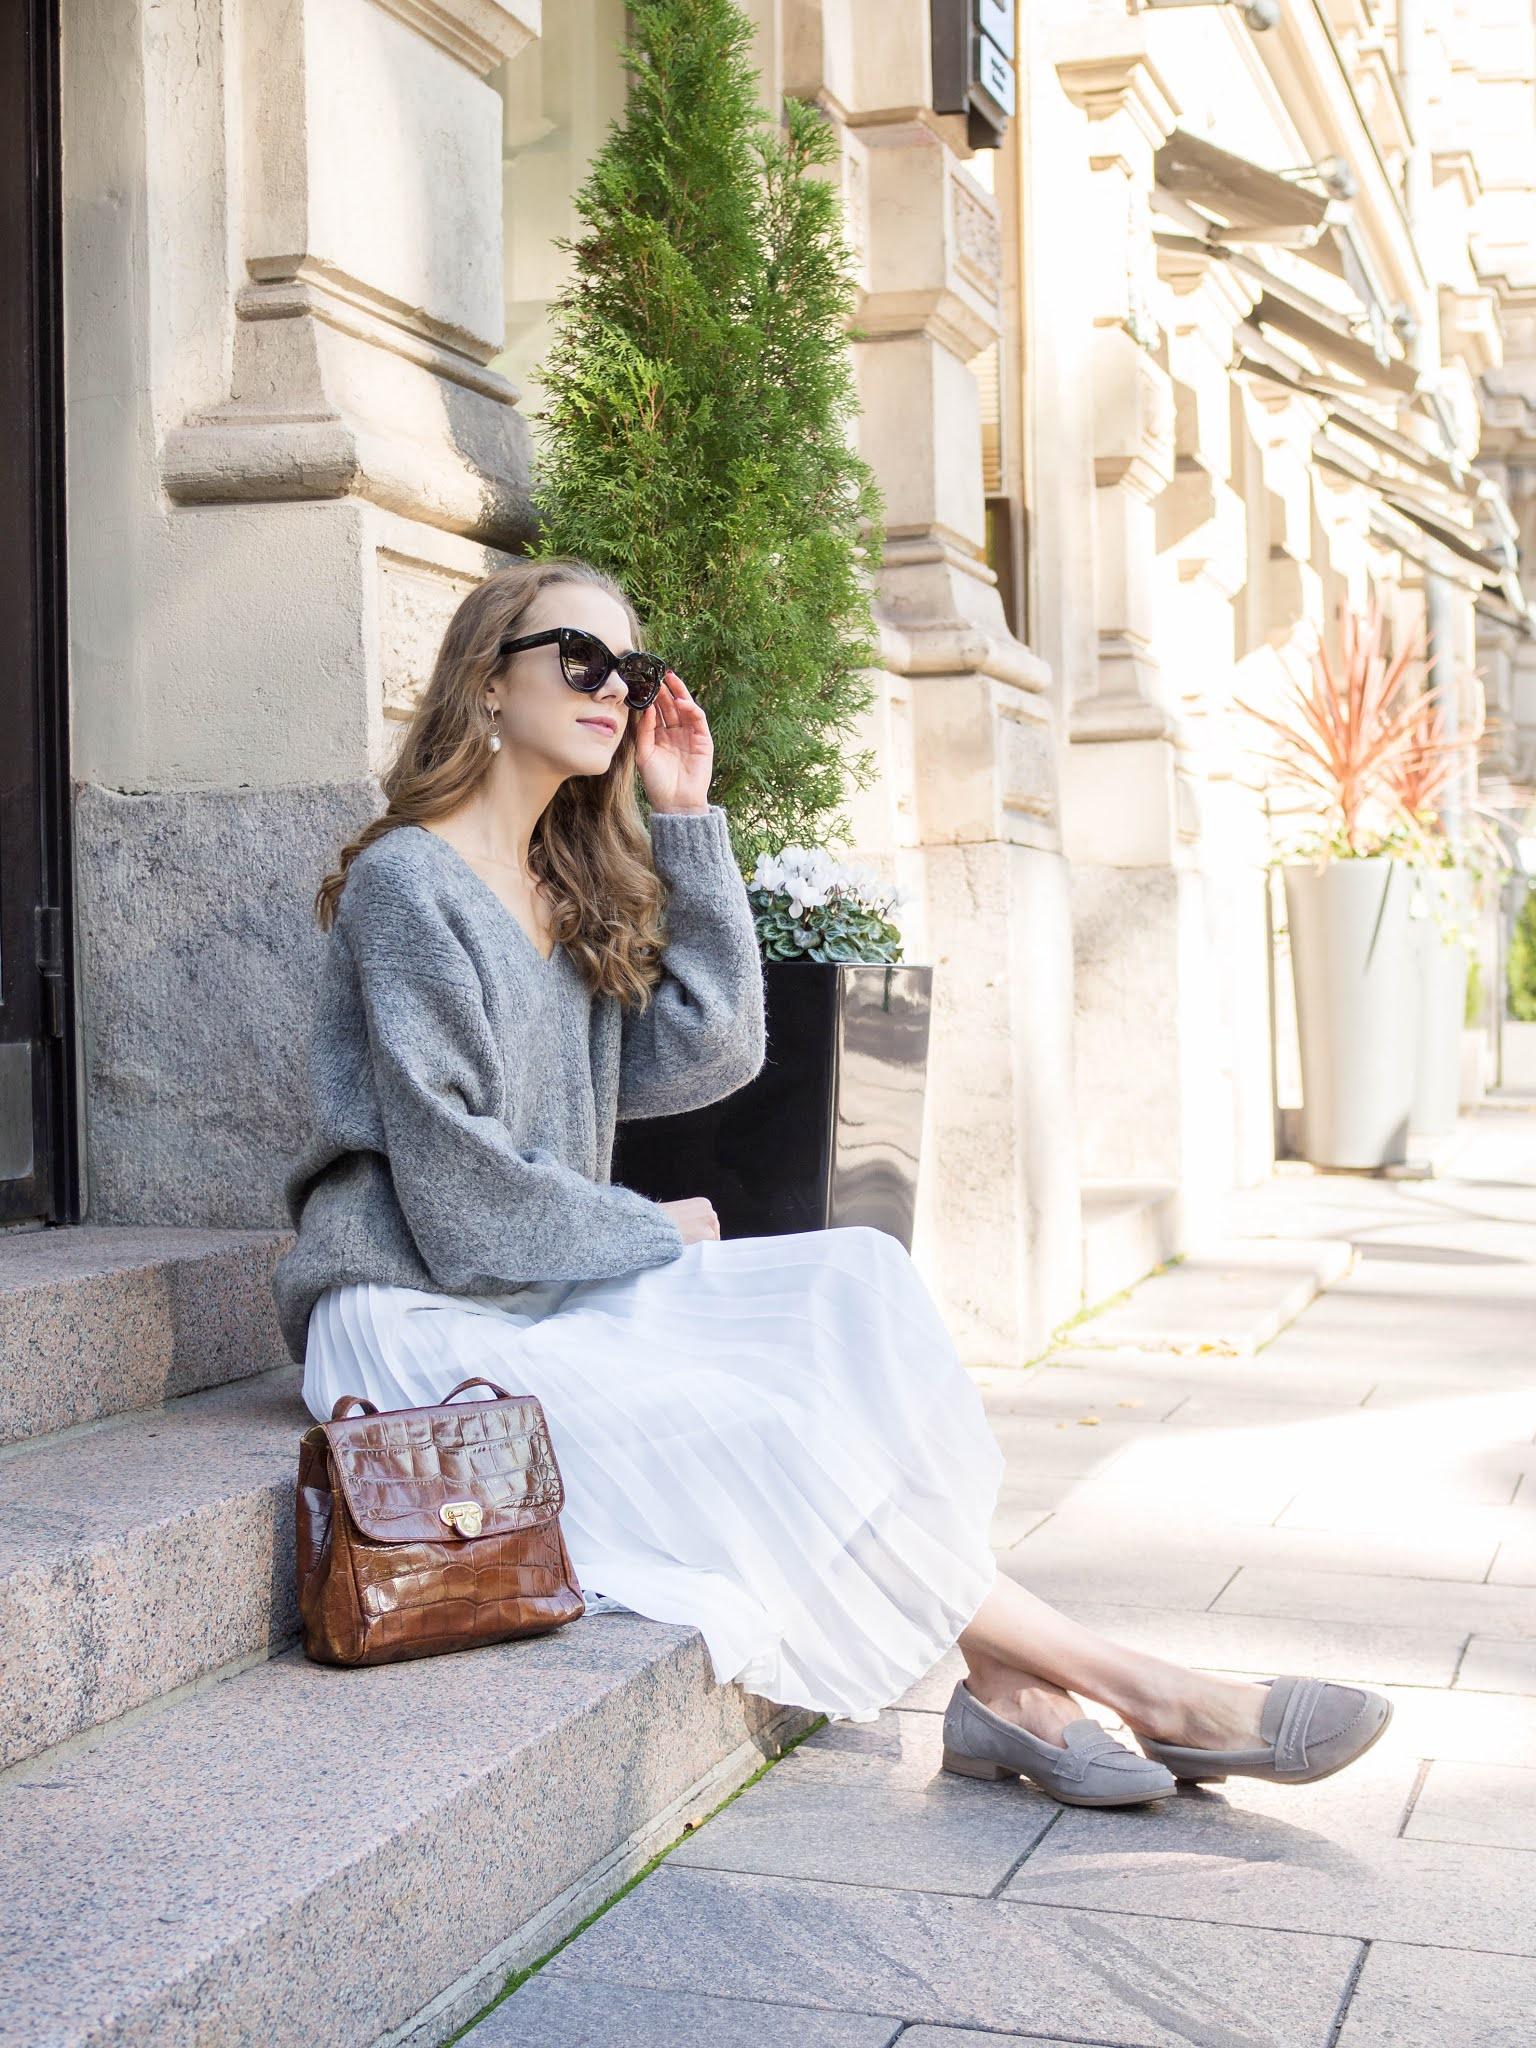 Kuinka pukeutua kuin pariisitar // How to dress Parisian